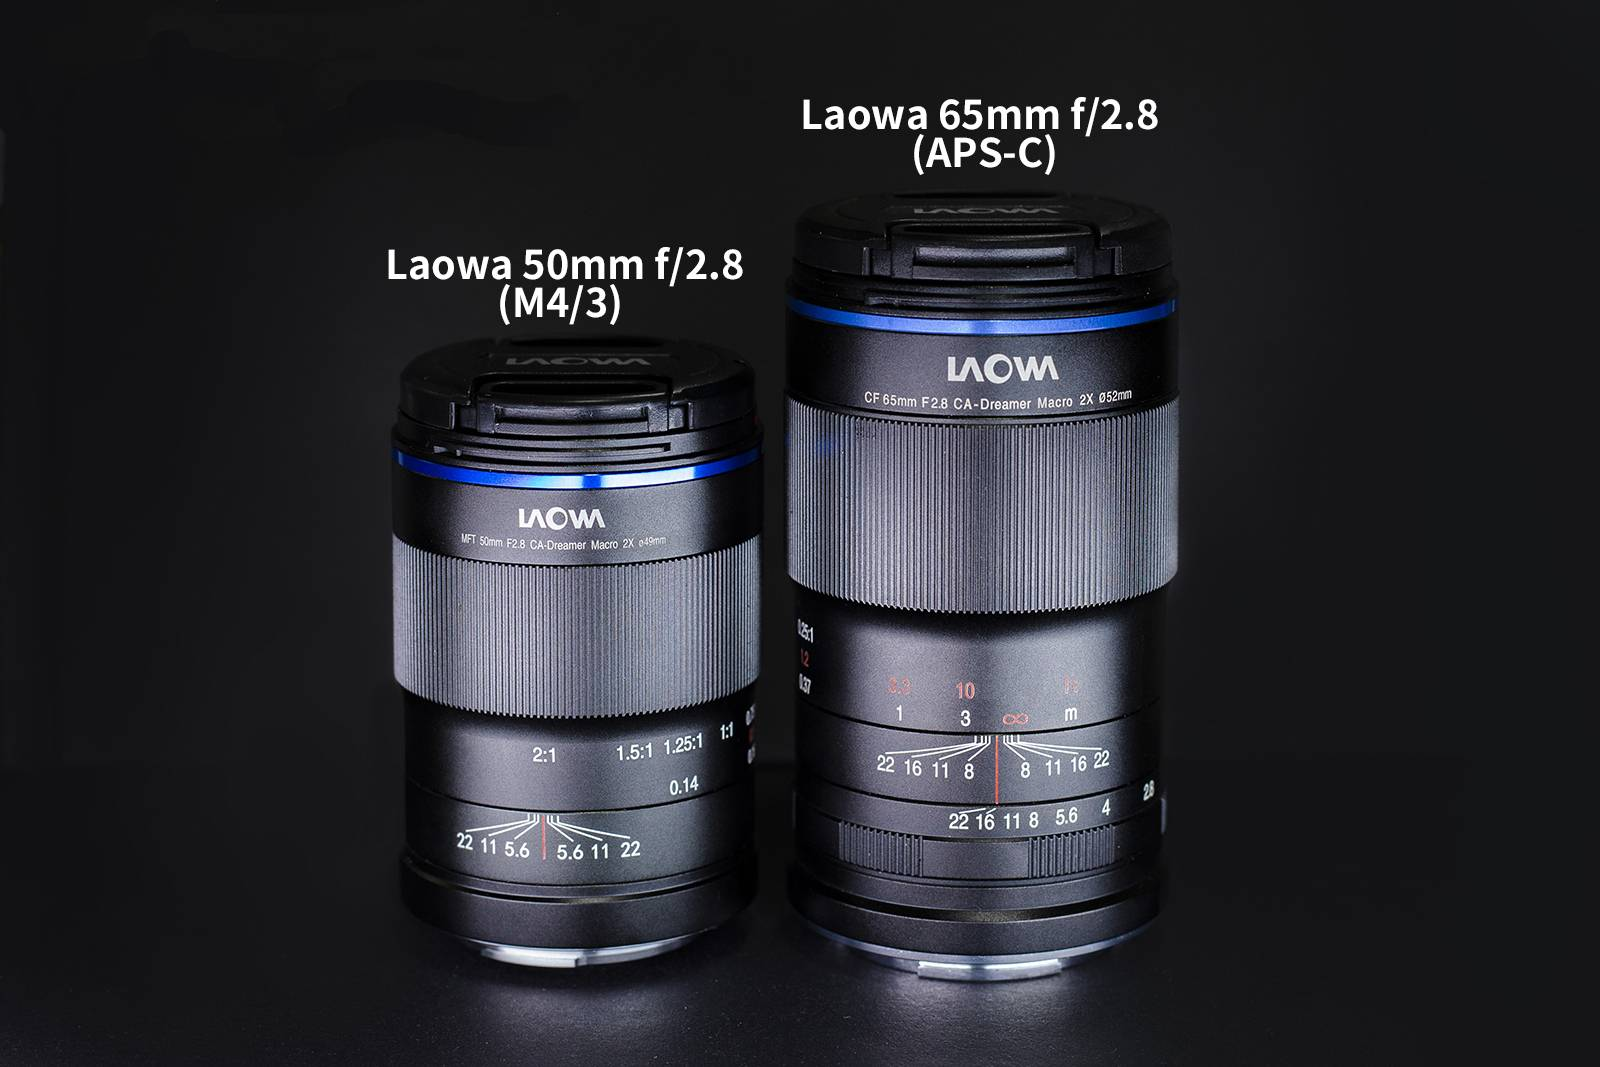 Venus Optics Laowa 50mm f/2.8 lens for Micro 4/3